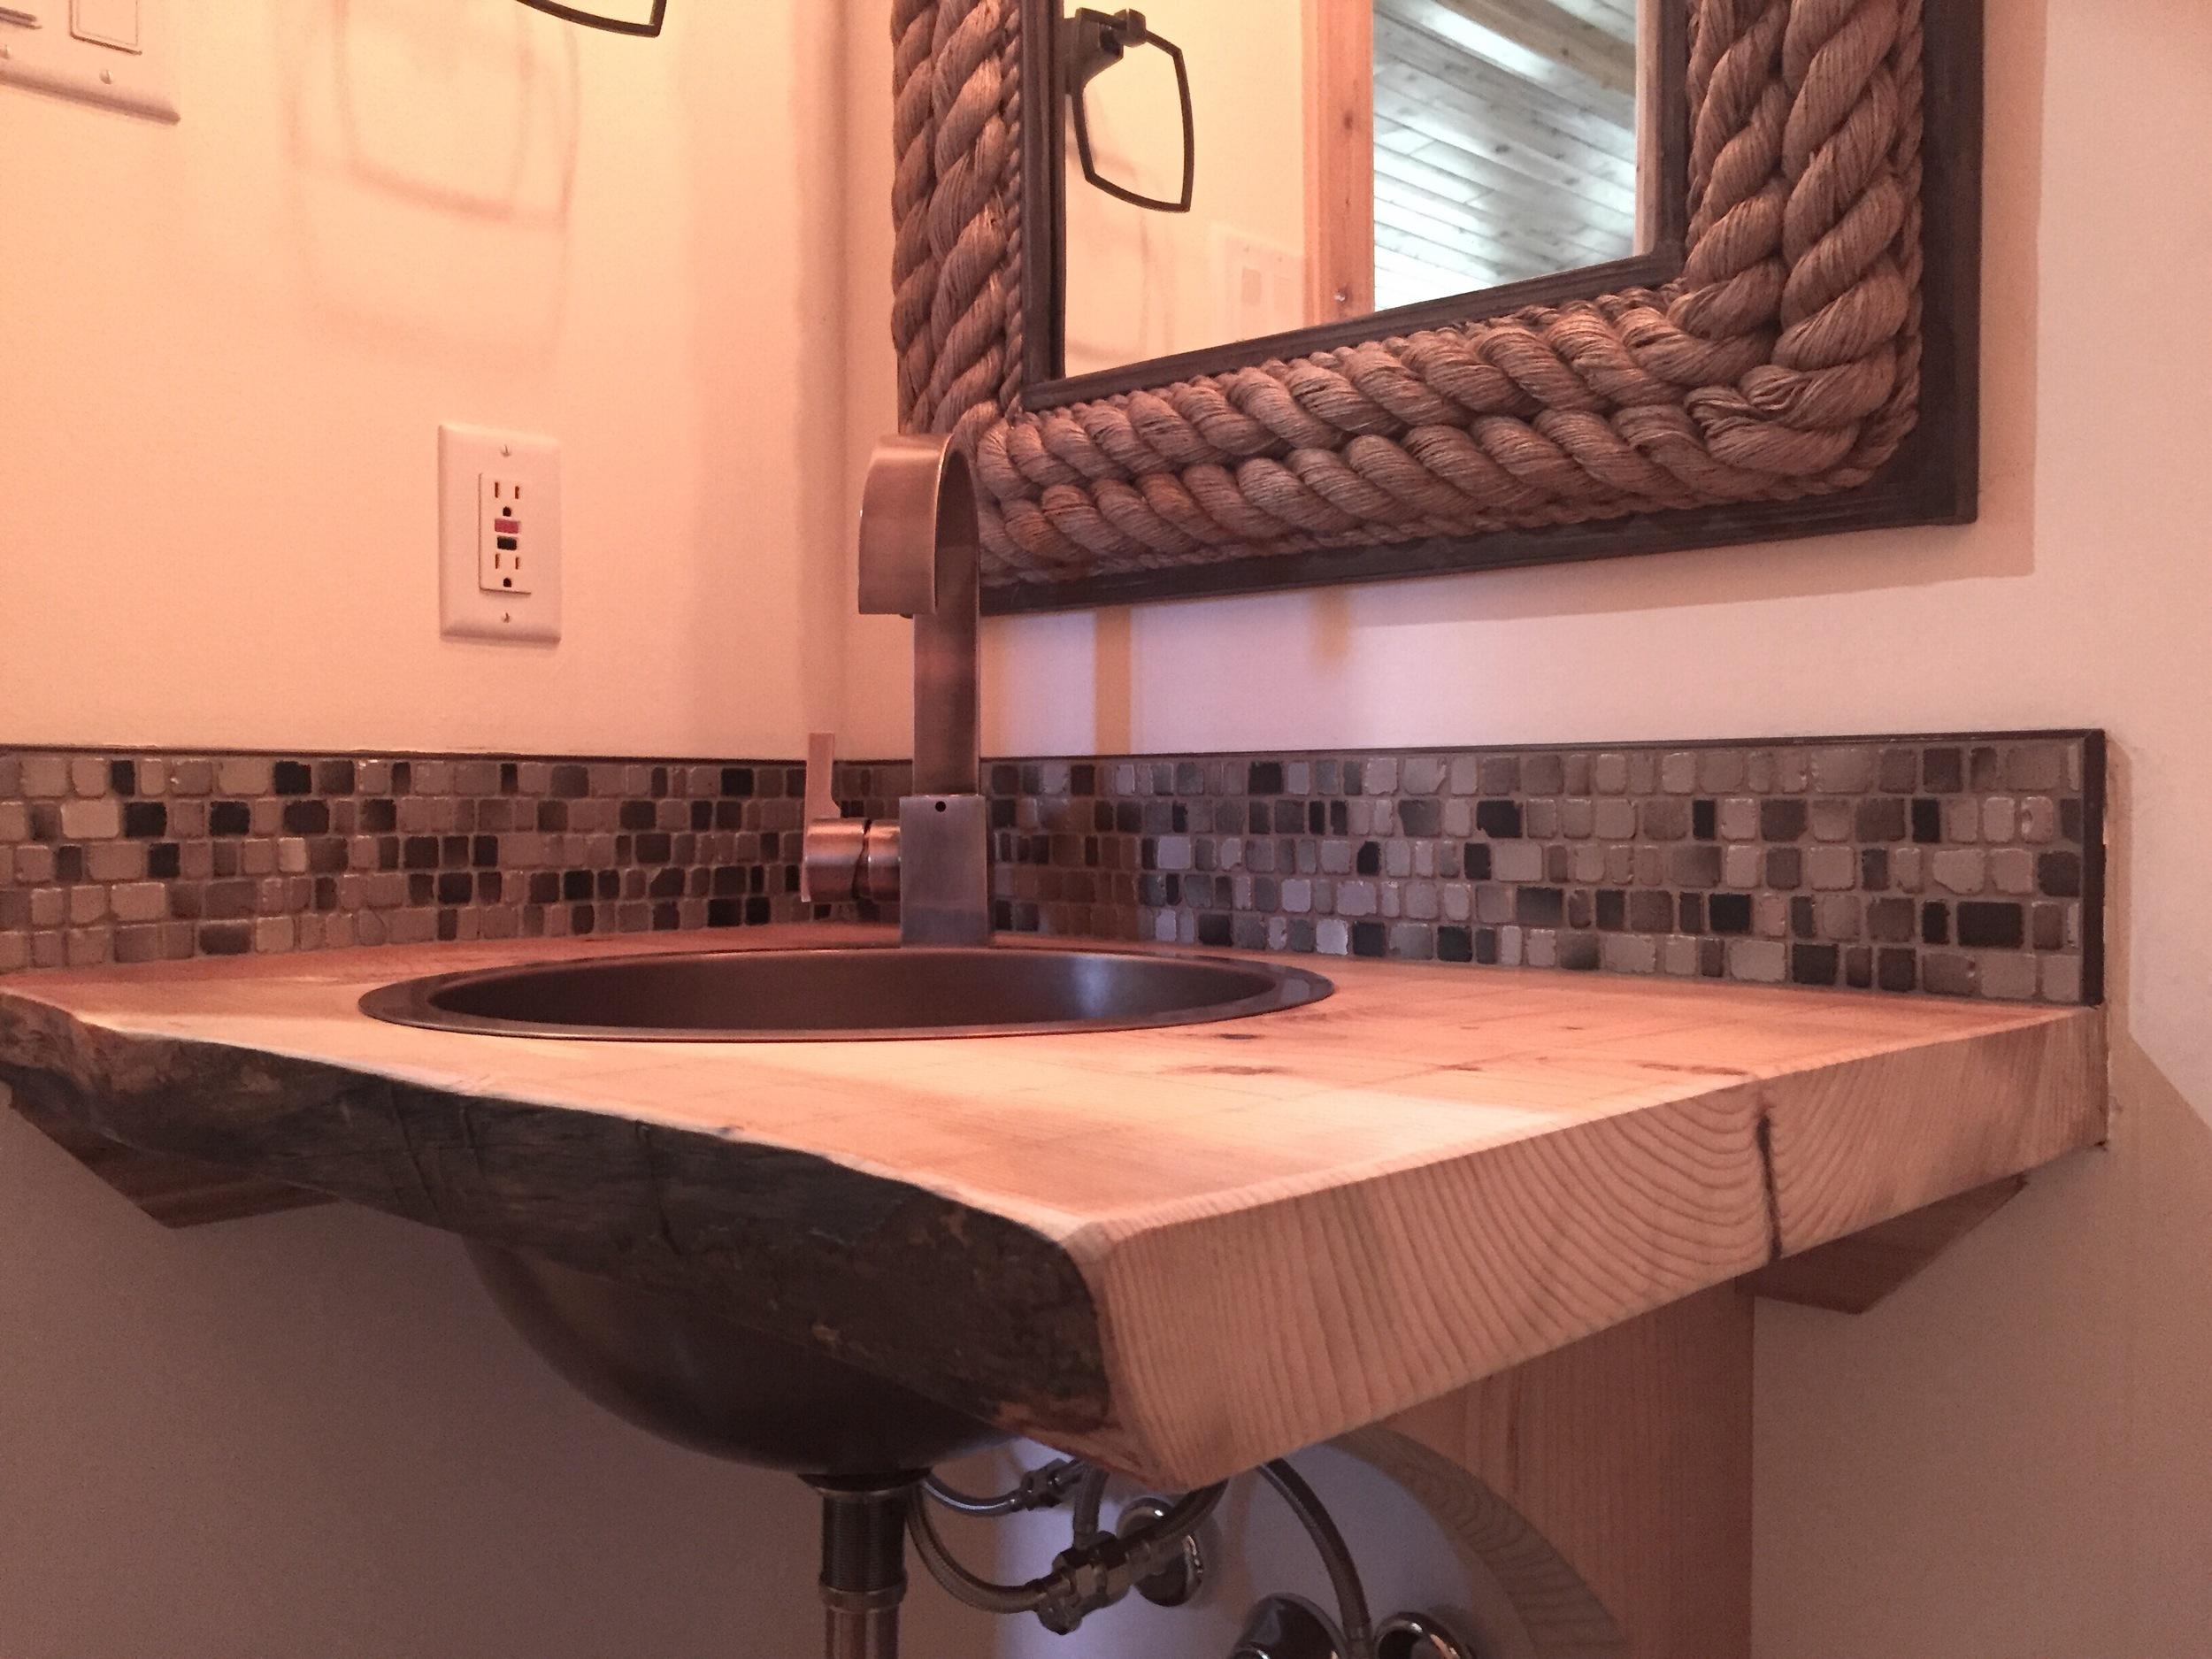 Rustic live edge countertop, antique copper sink and faucet, glass backsplash.